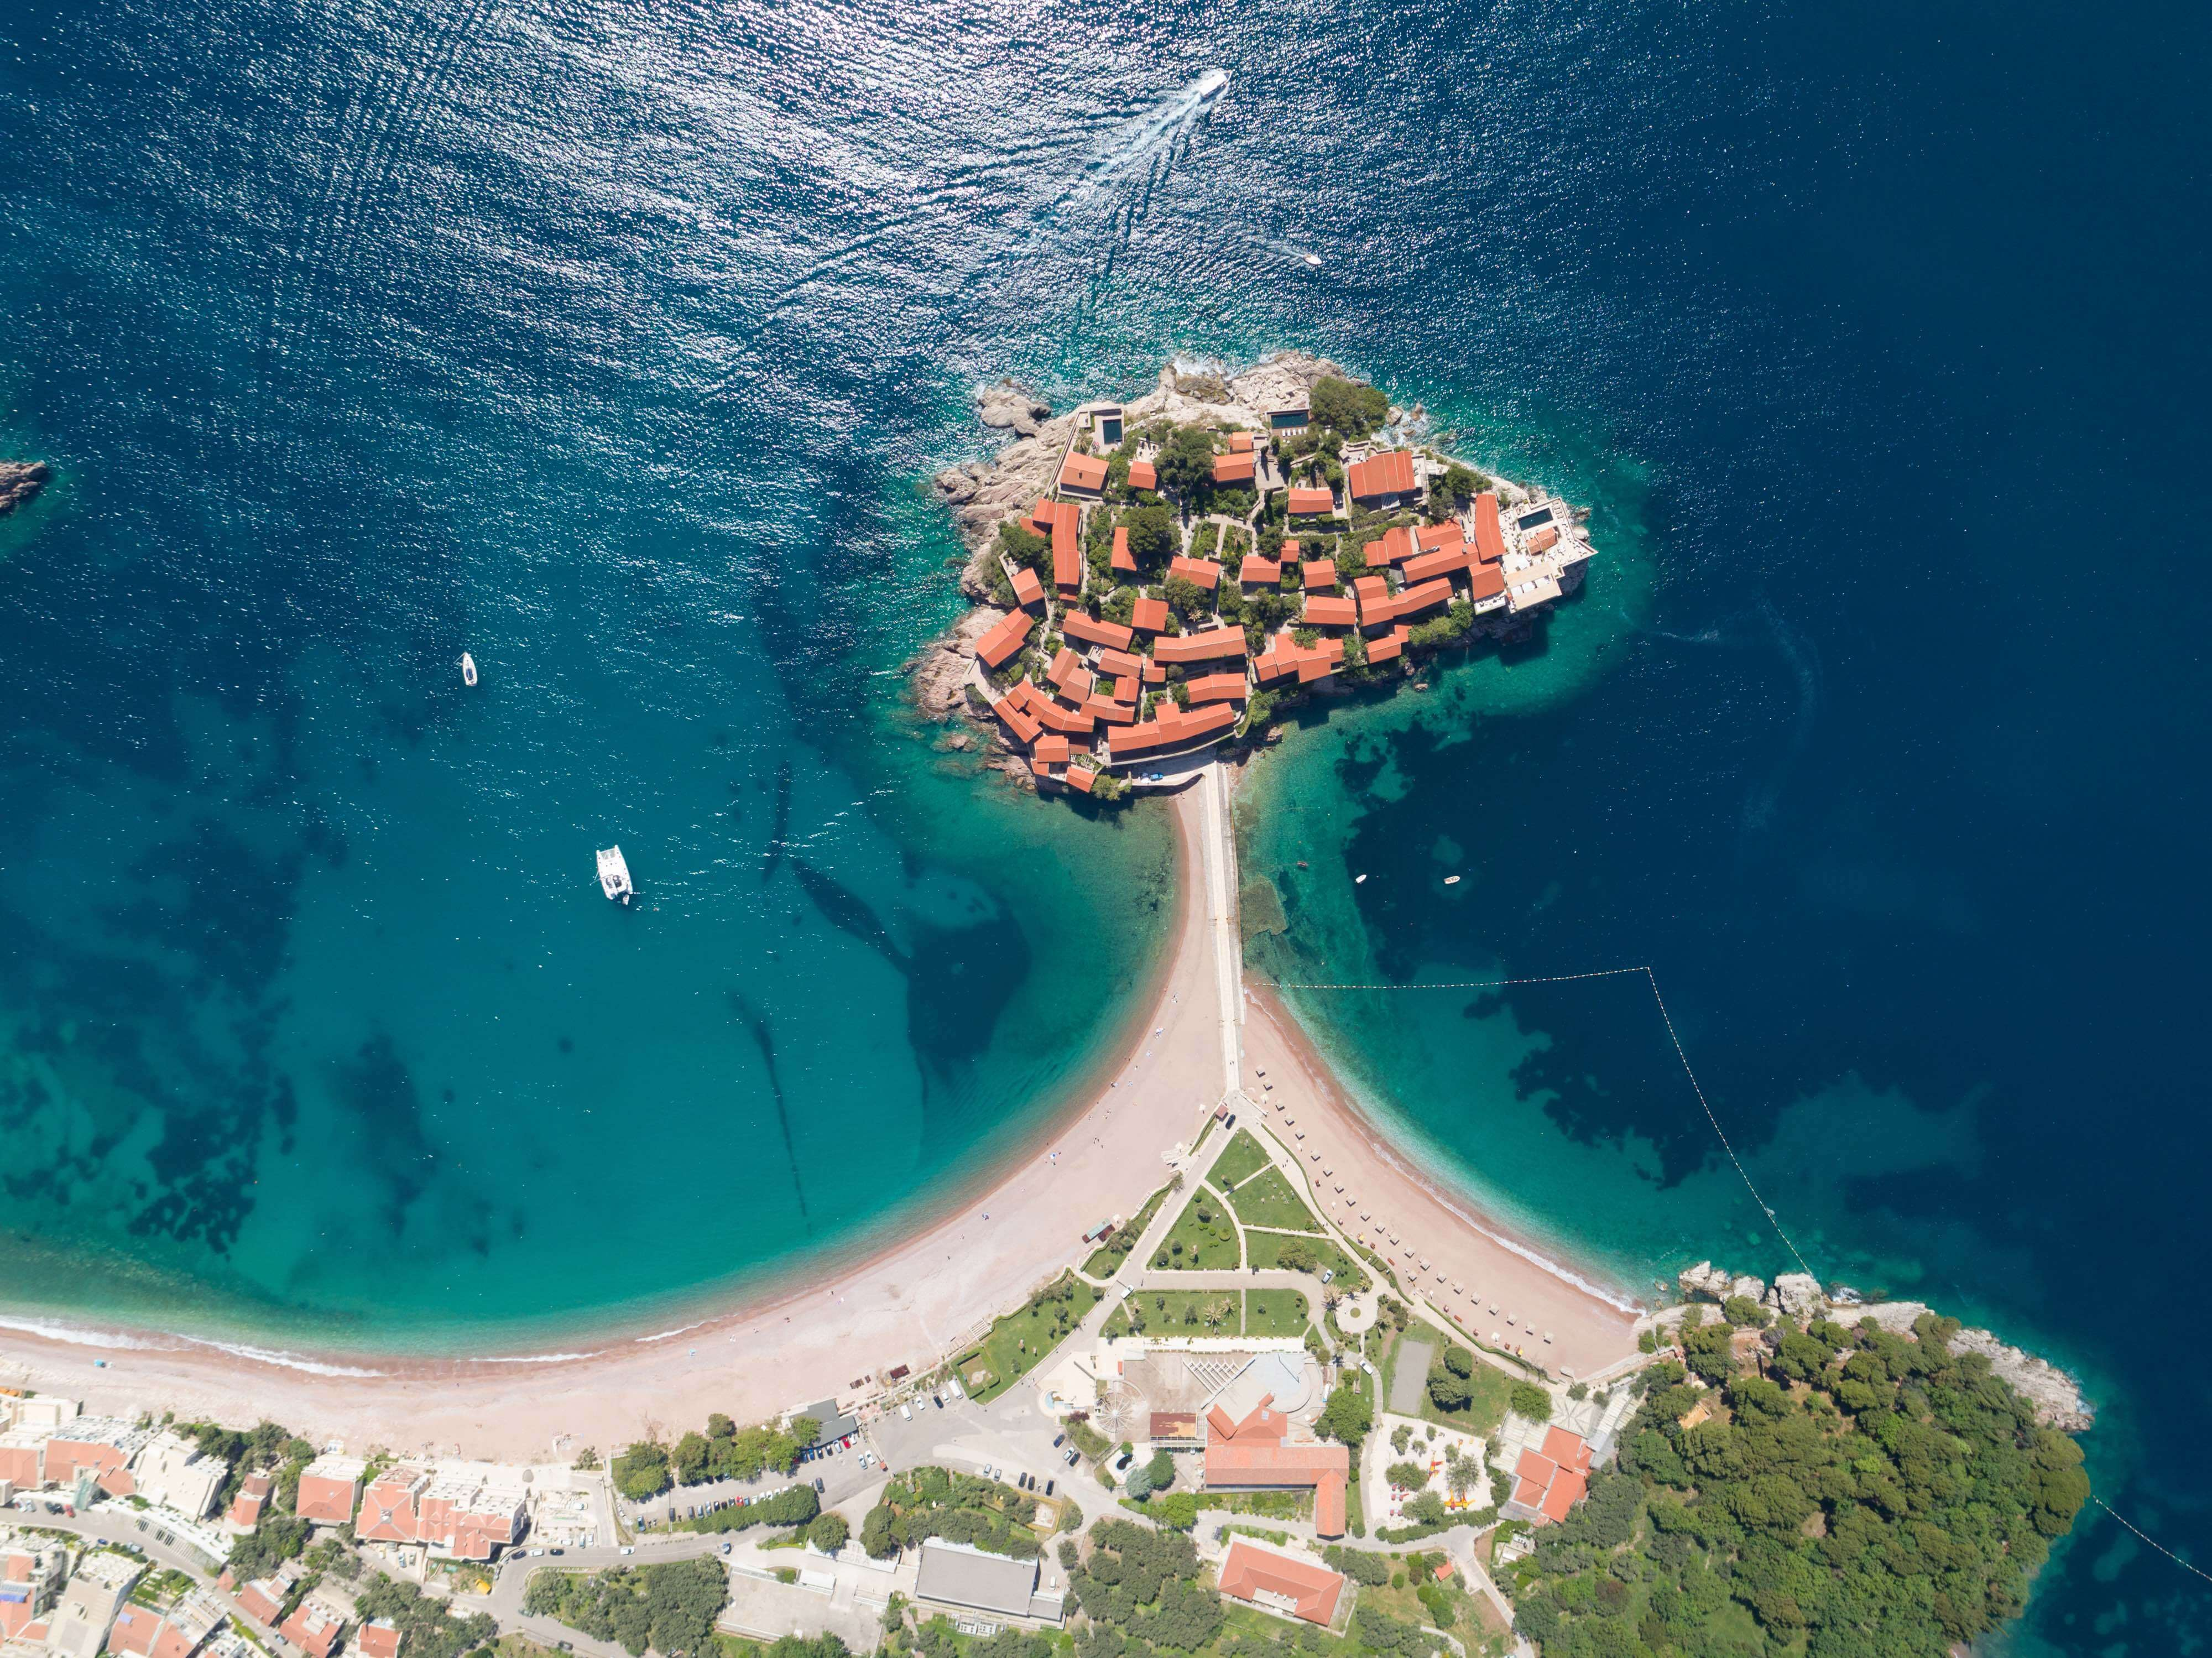 The Sveti Stefan private island in Budva, Montenegro.